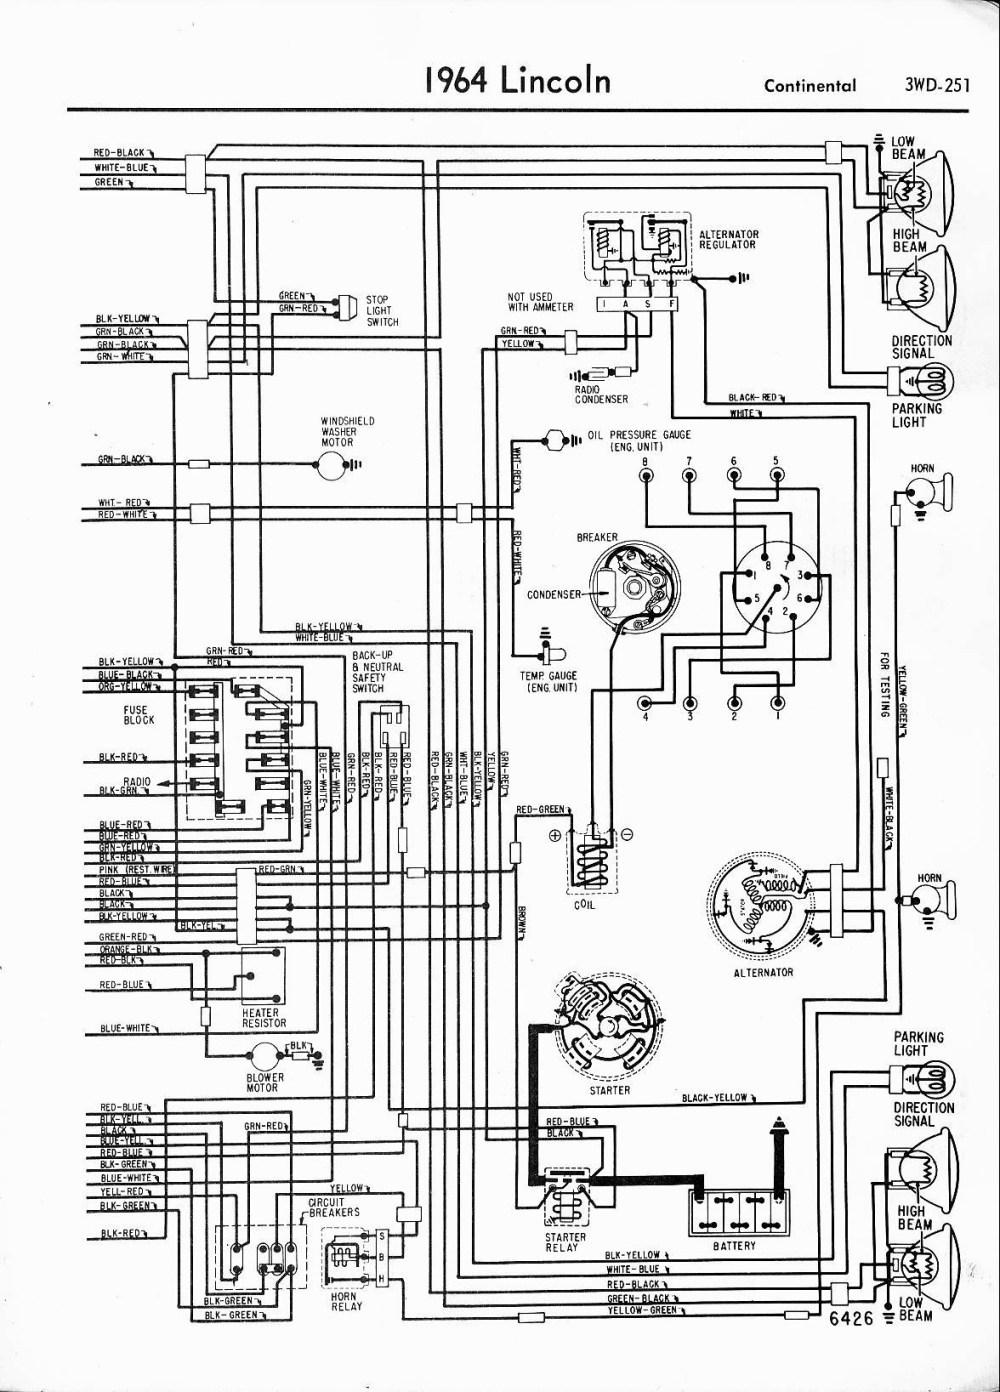 medium resolution of 2000 lincoln continental engine diagram wiring schematic